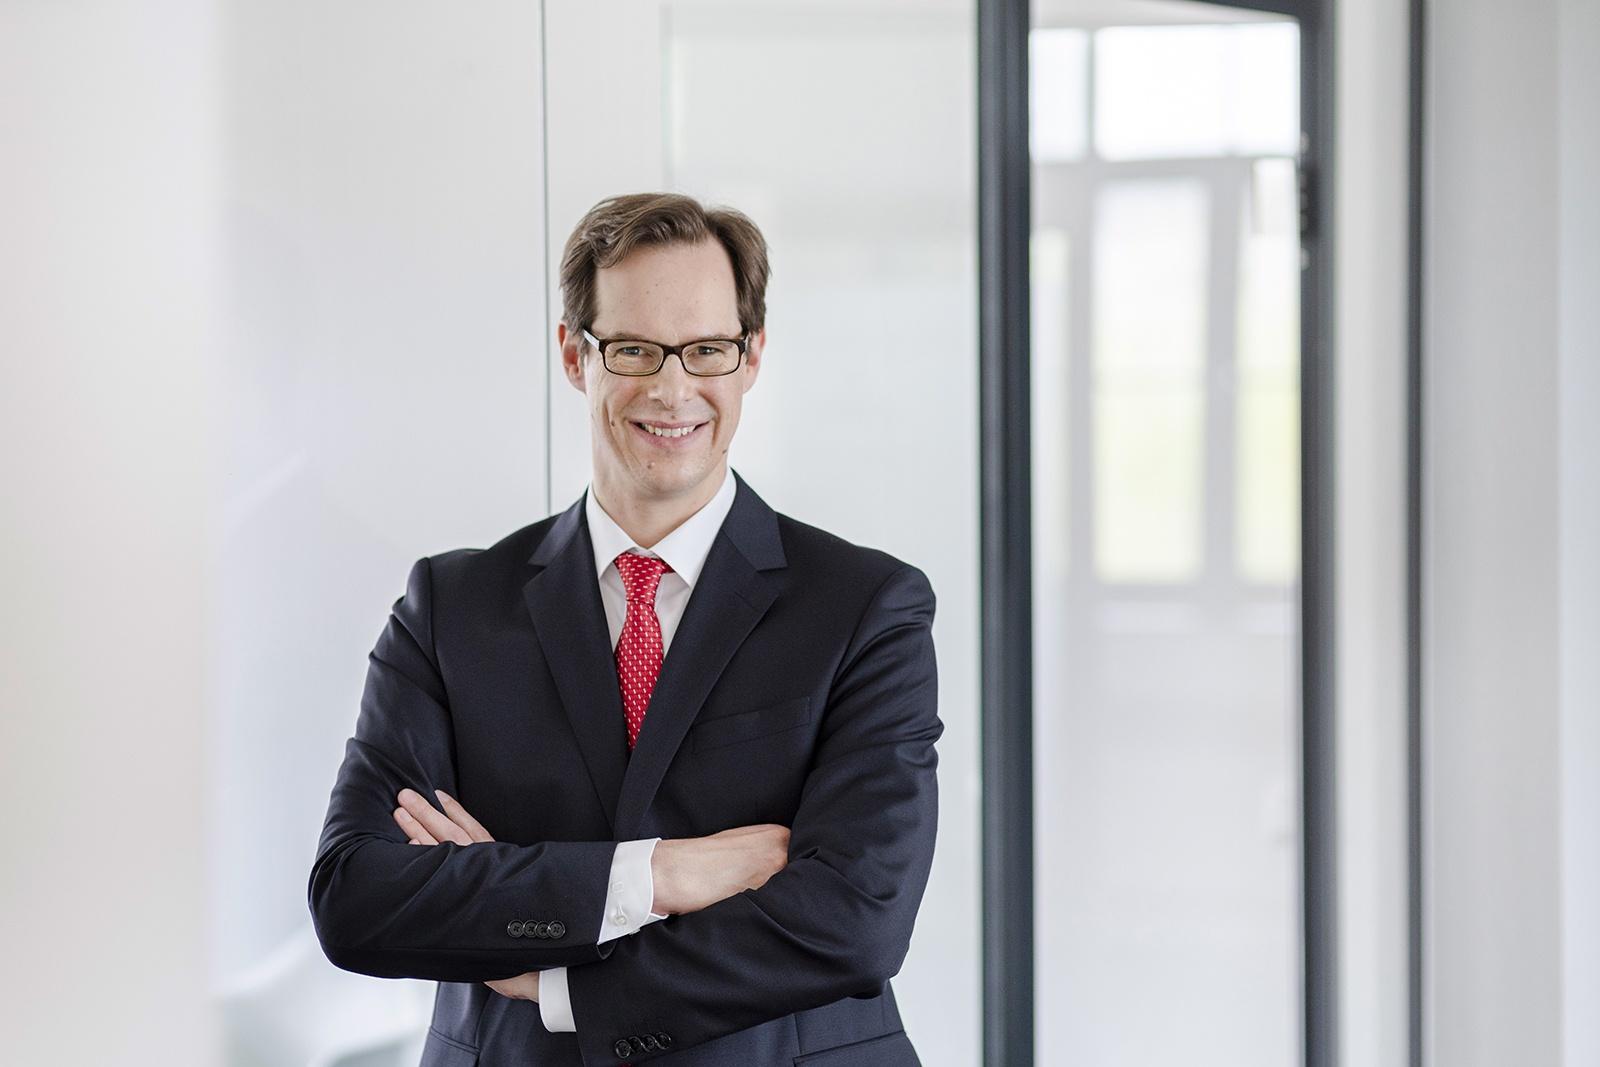 Rechtsanwalt Ernst Stephan Kelter